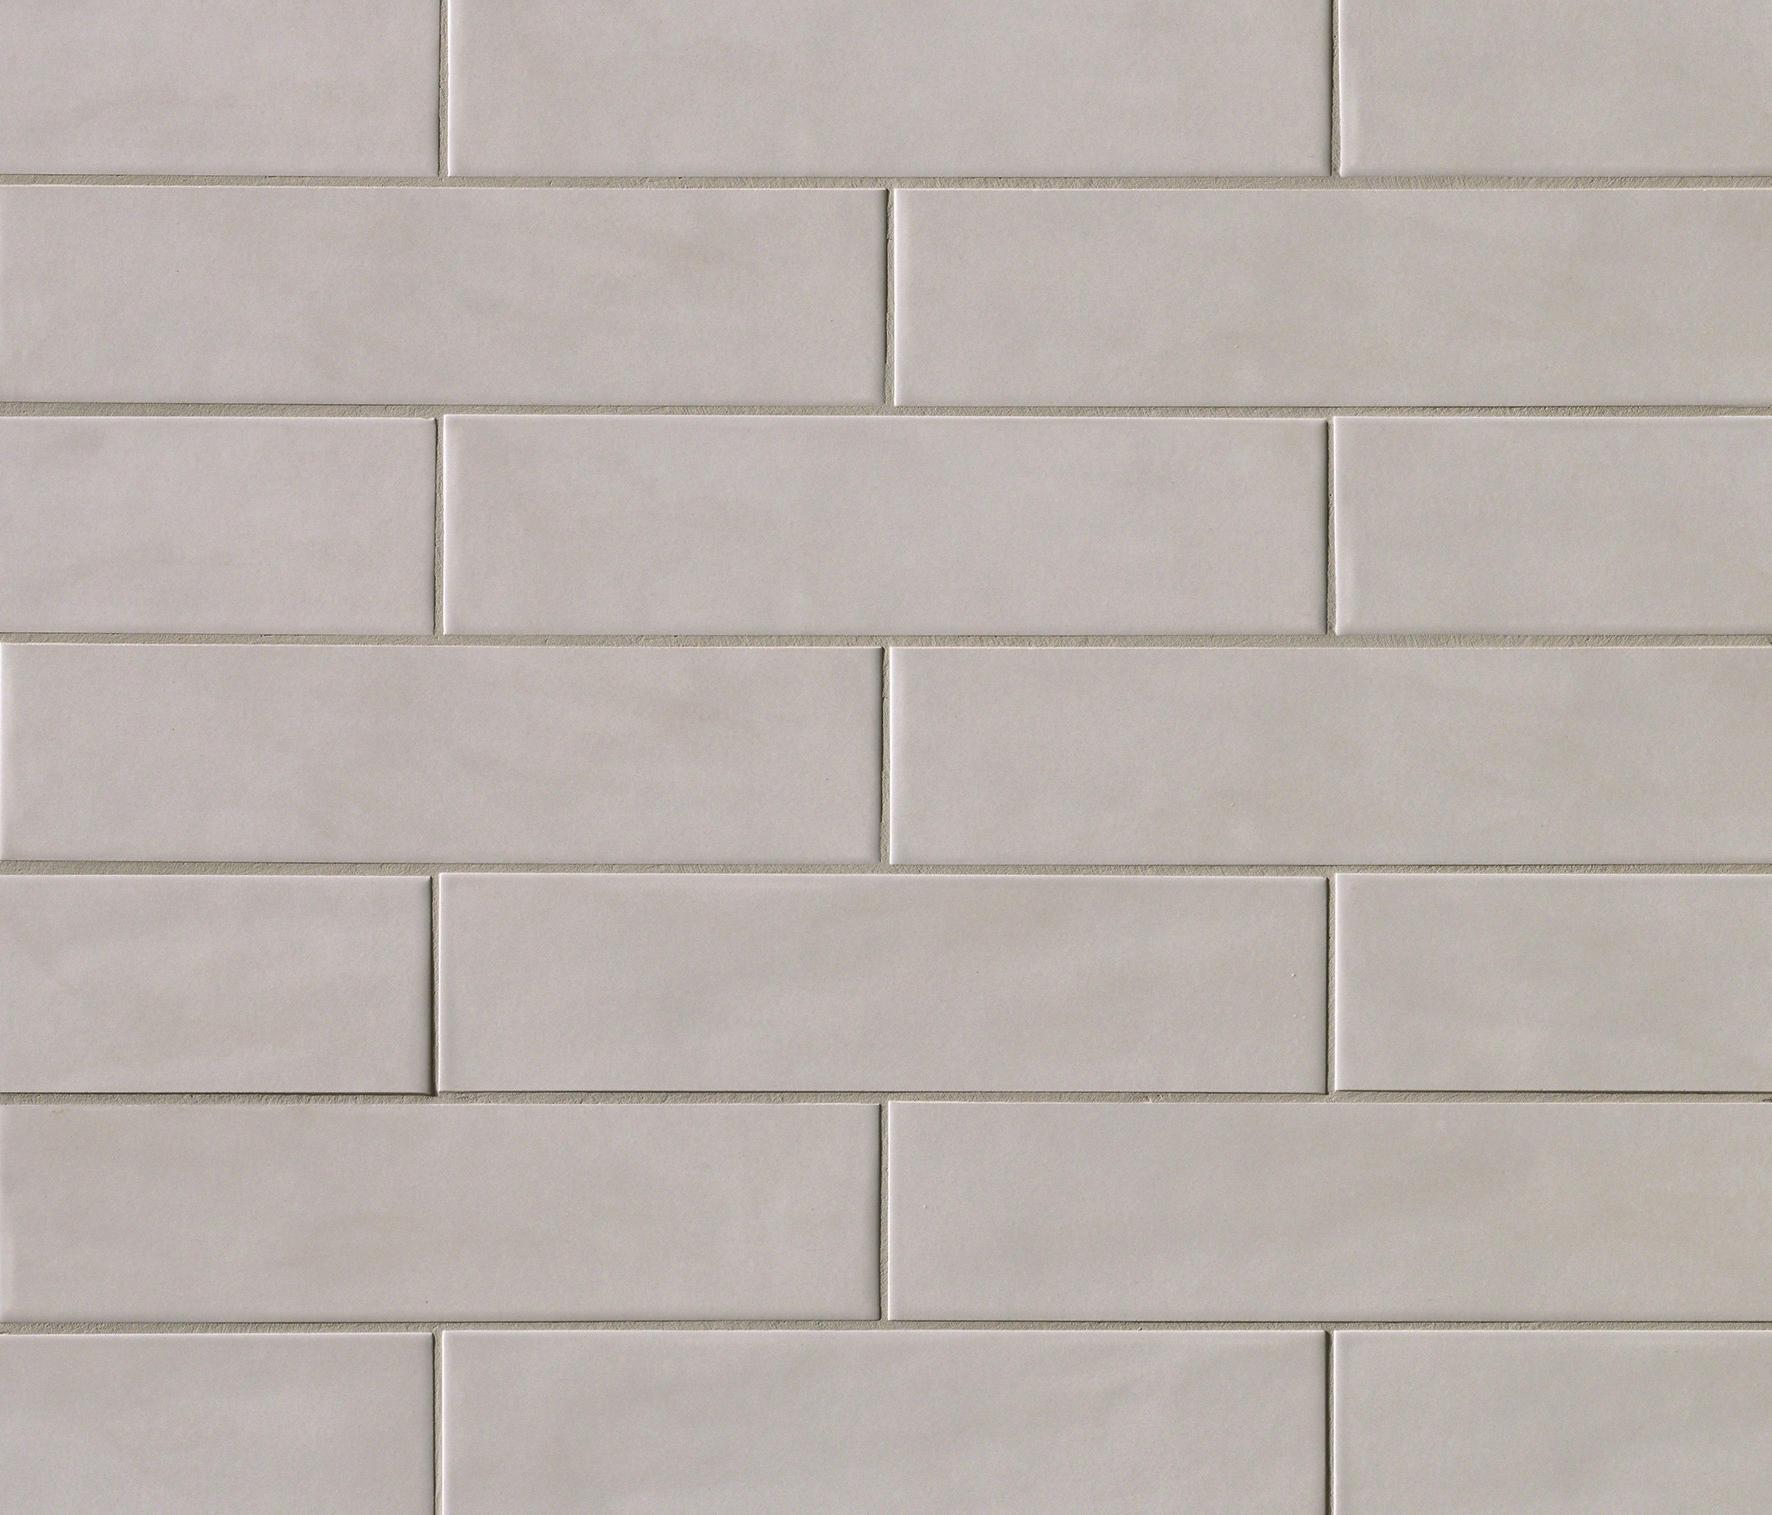 boston cemento ceramic tiles from fap